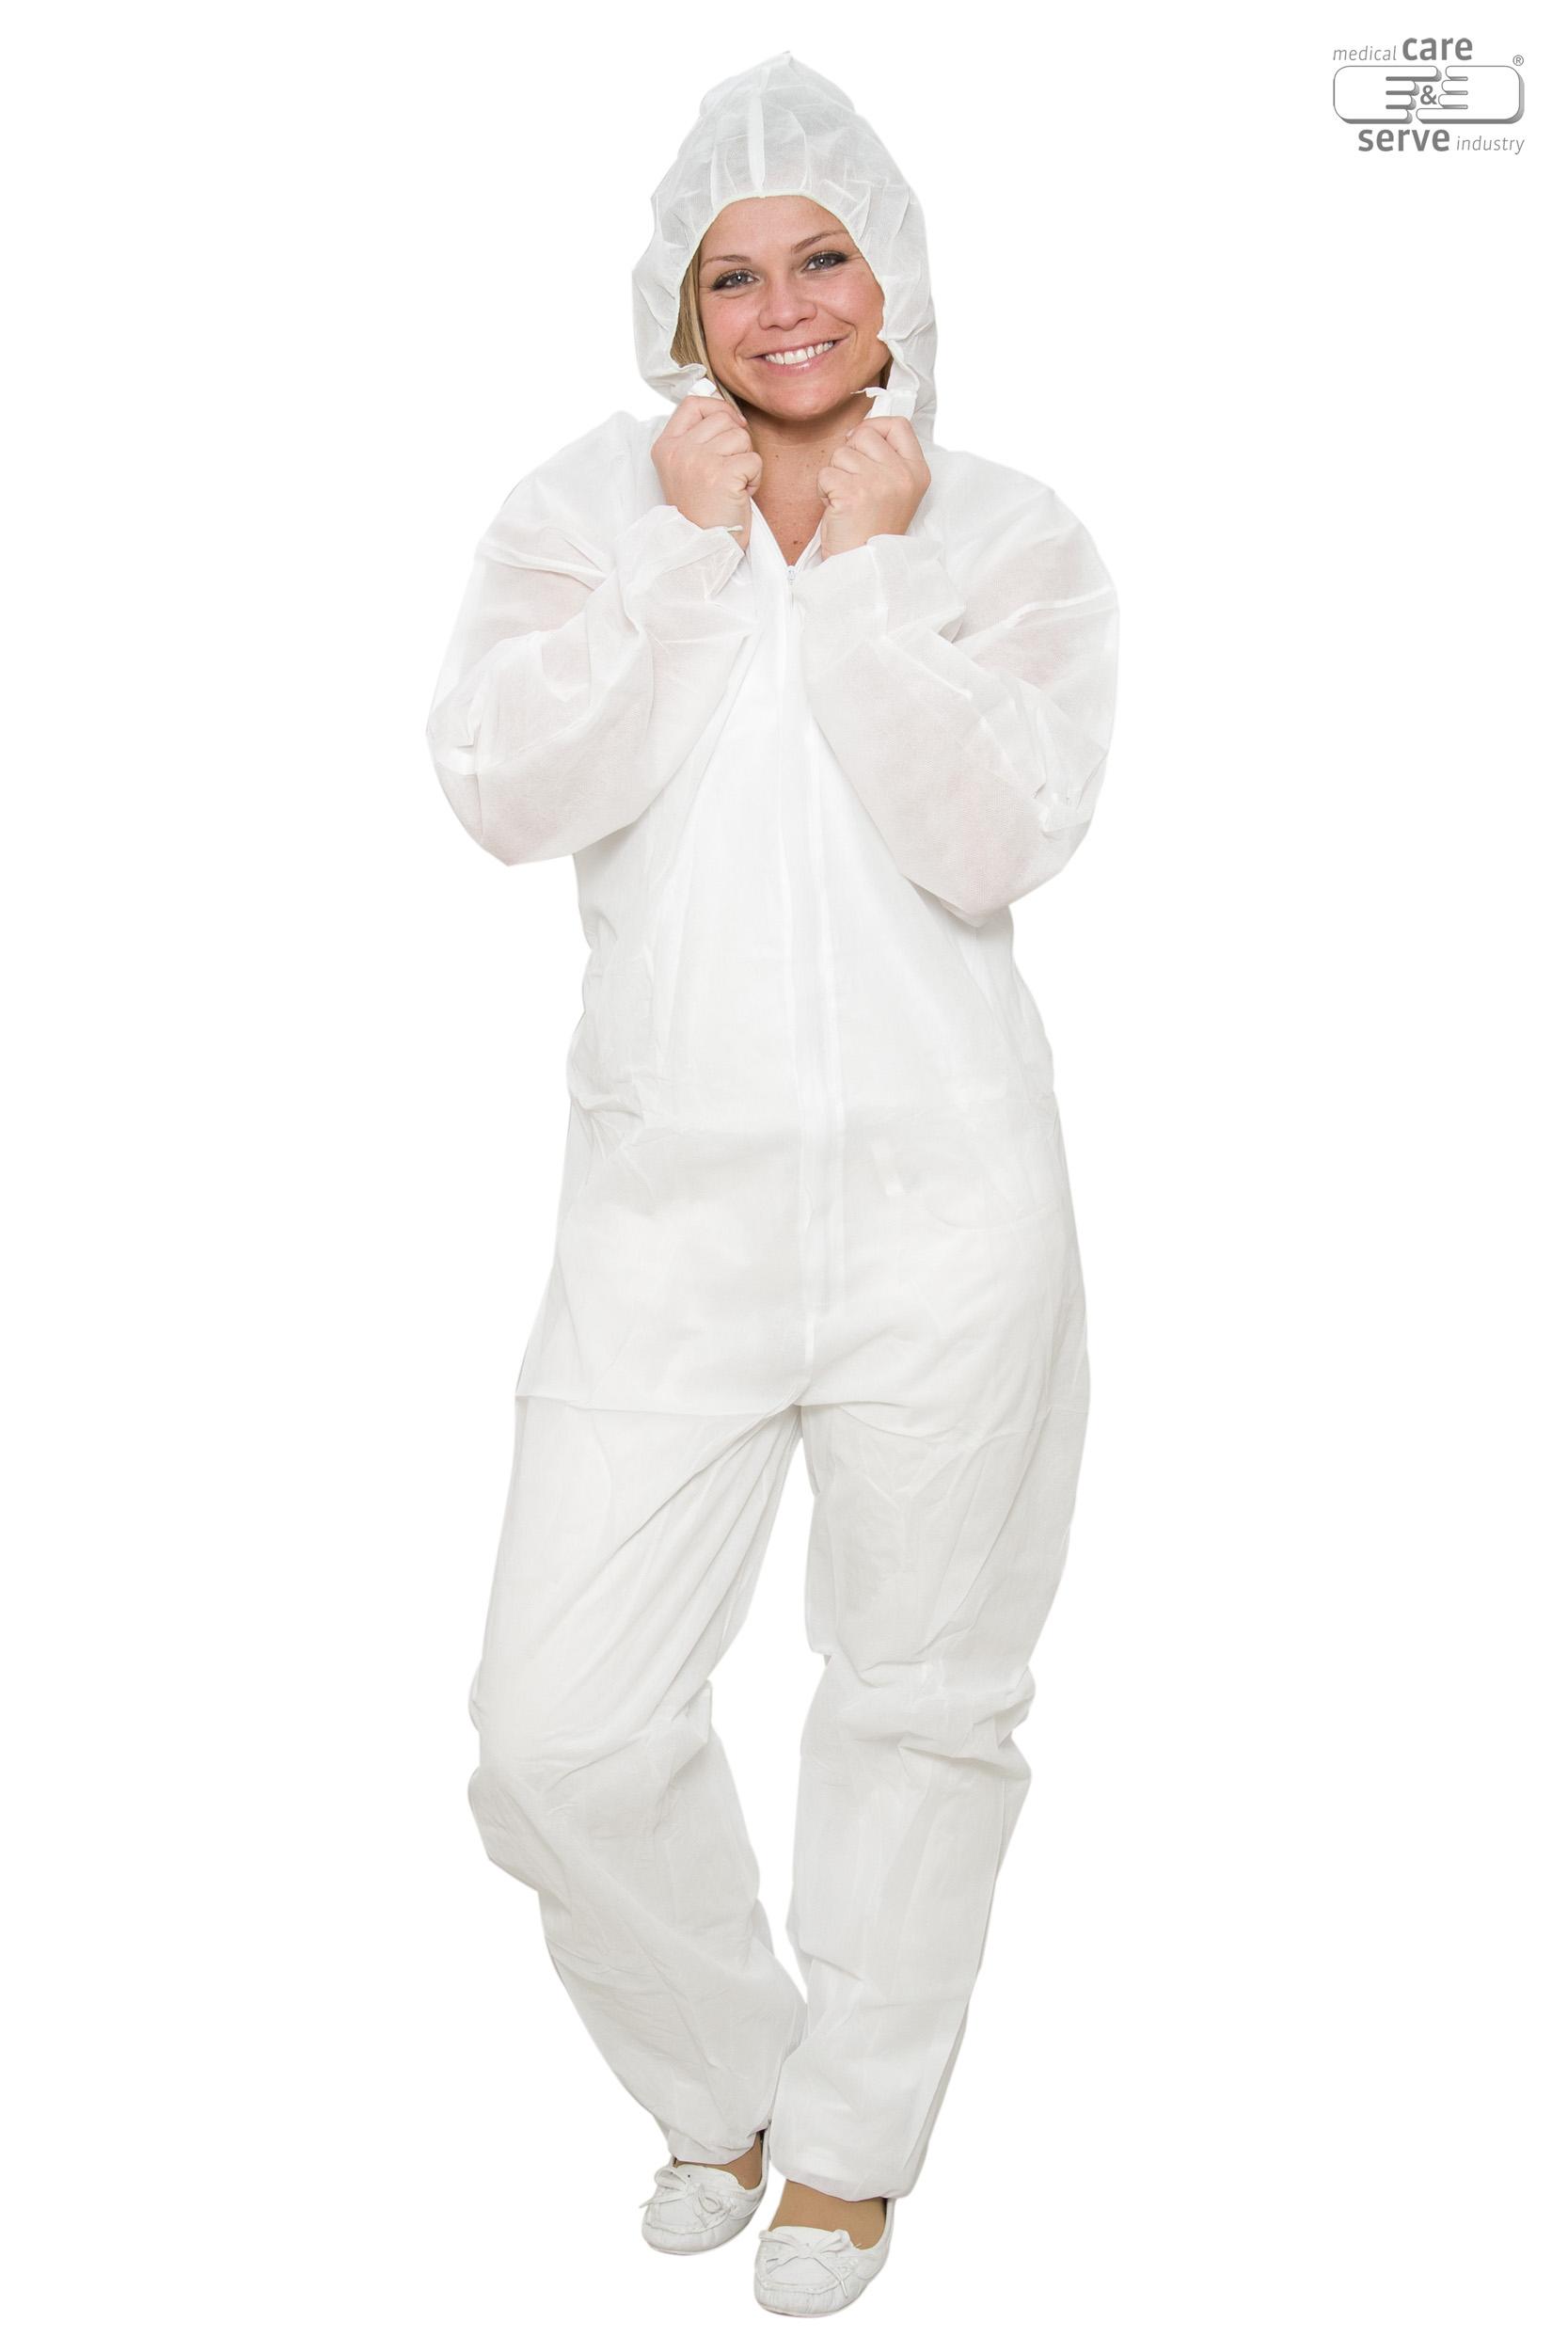 WIROS PP-Einweg-Anzug mit Kapuze extra dick